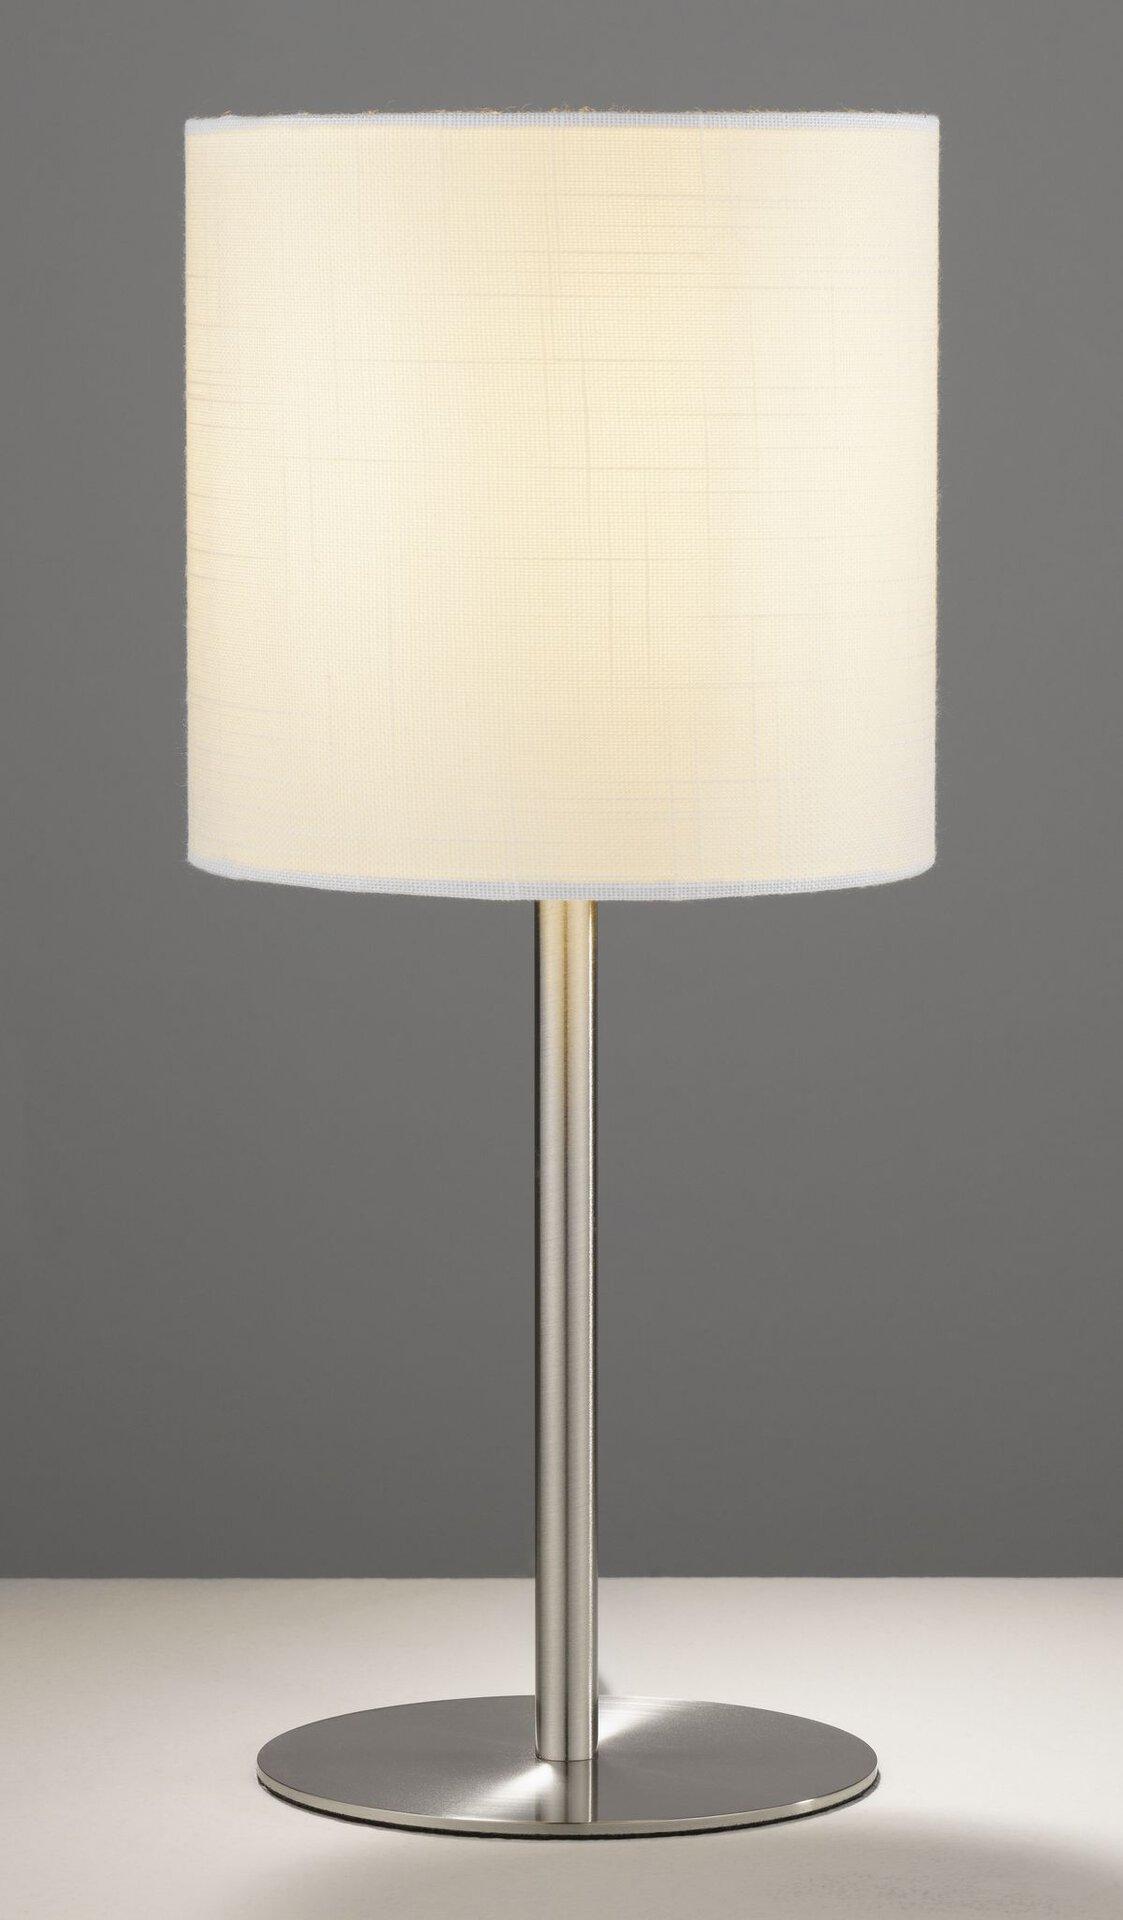 Tischleuchte LIA  Homing  Casa Nova Casa Nova Metall silber 18 x 40 x 18 cm